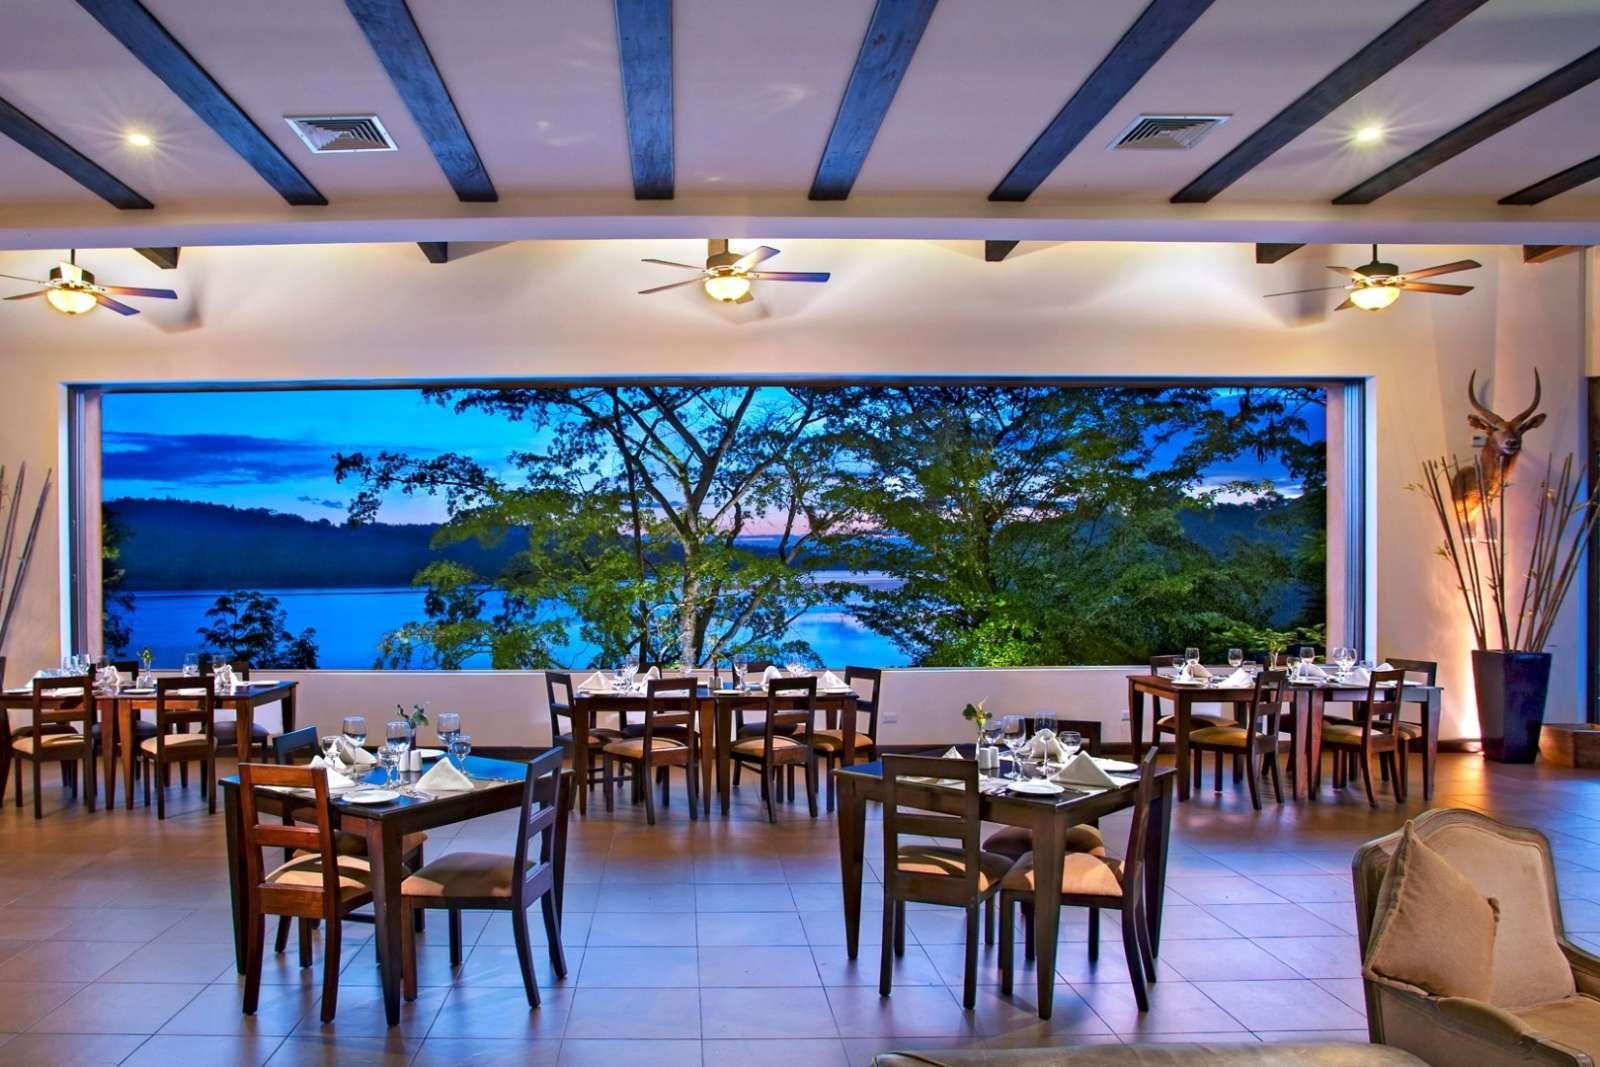 Restaurant at Hotel Las Lagunas, Guatemala